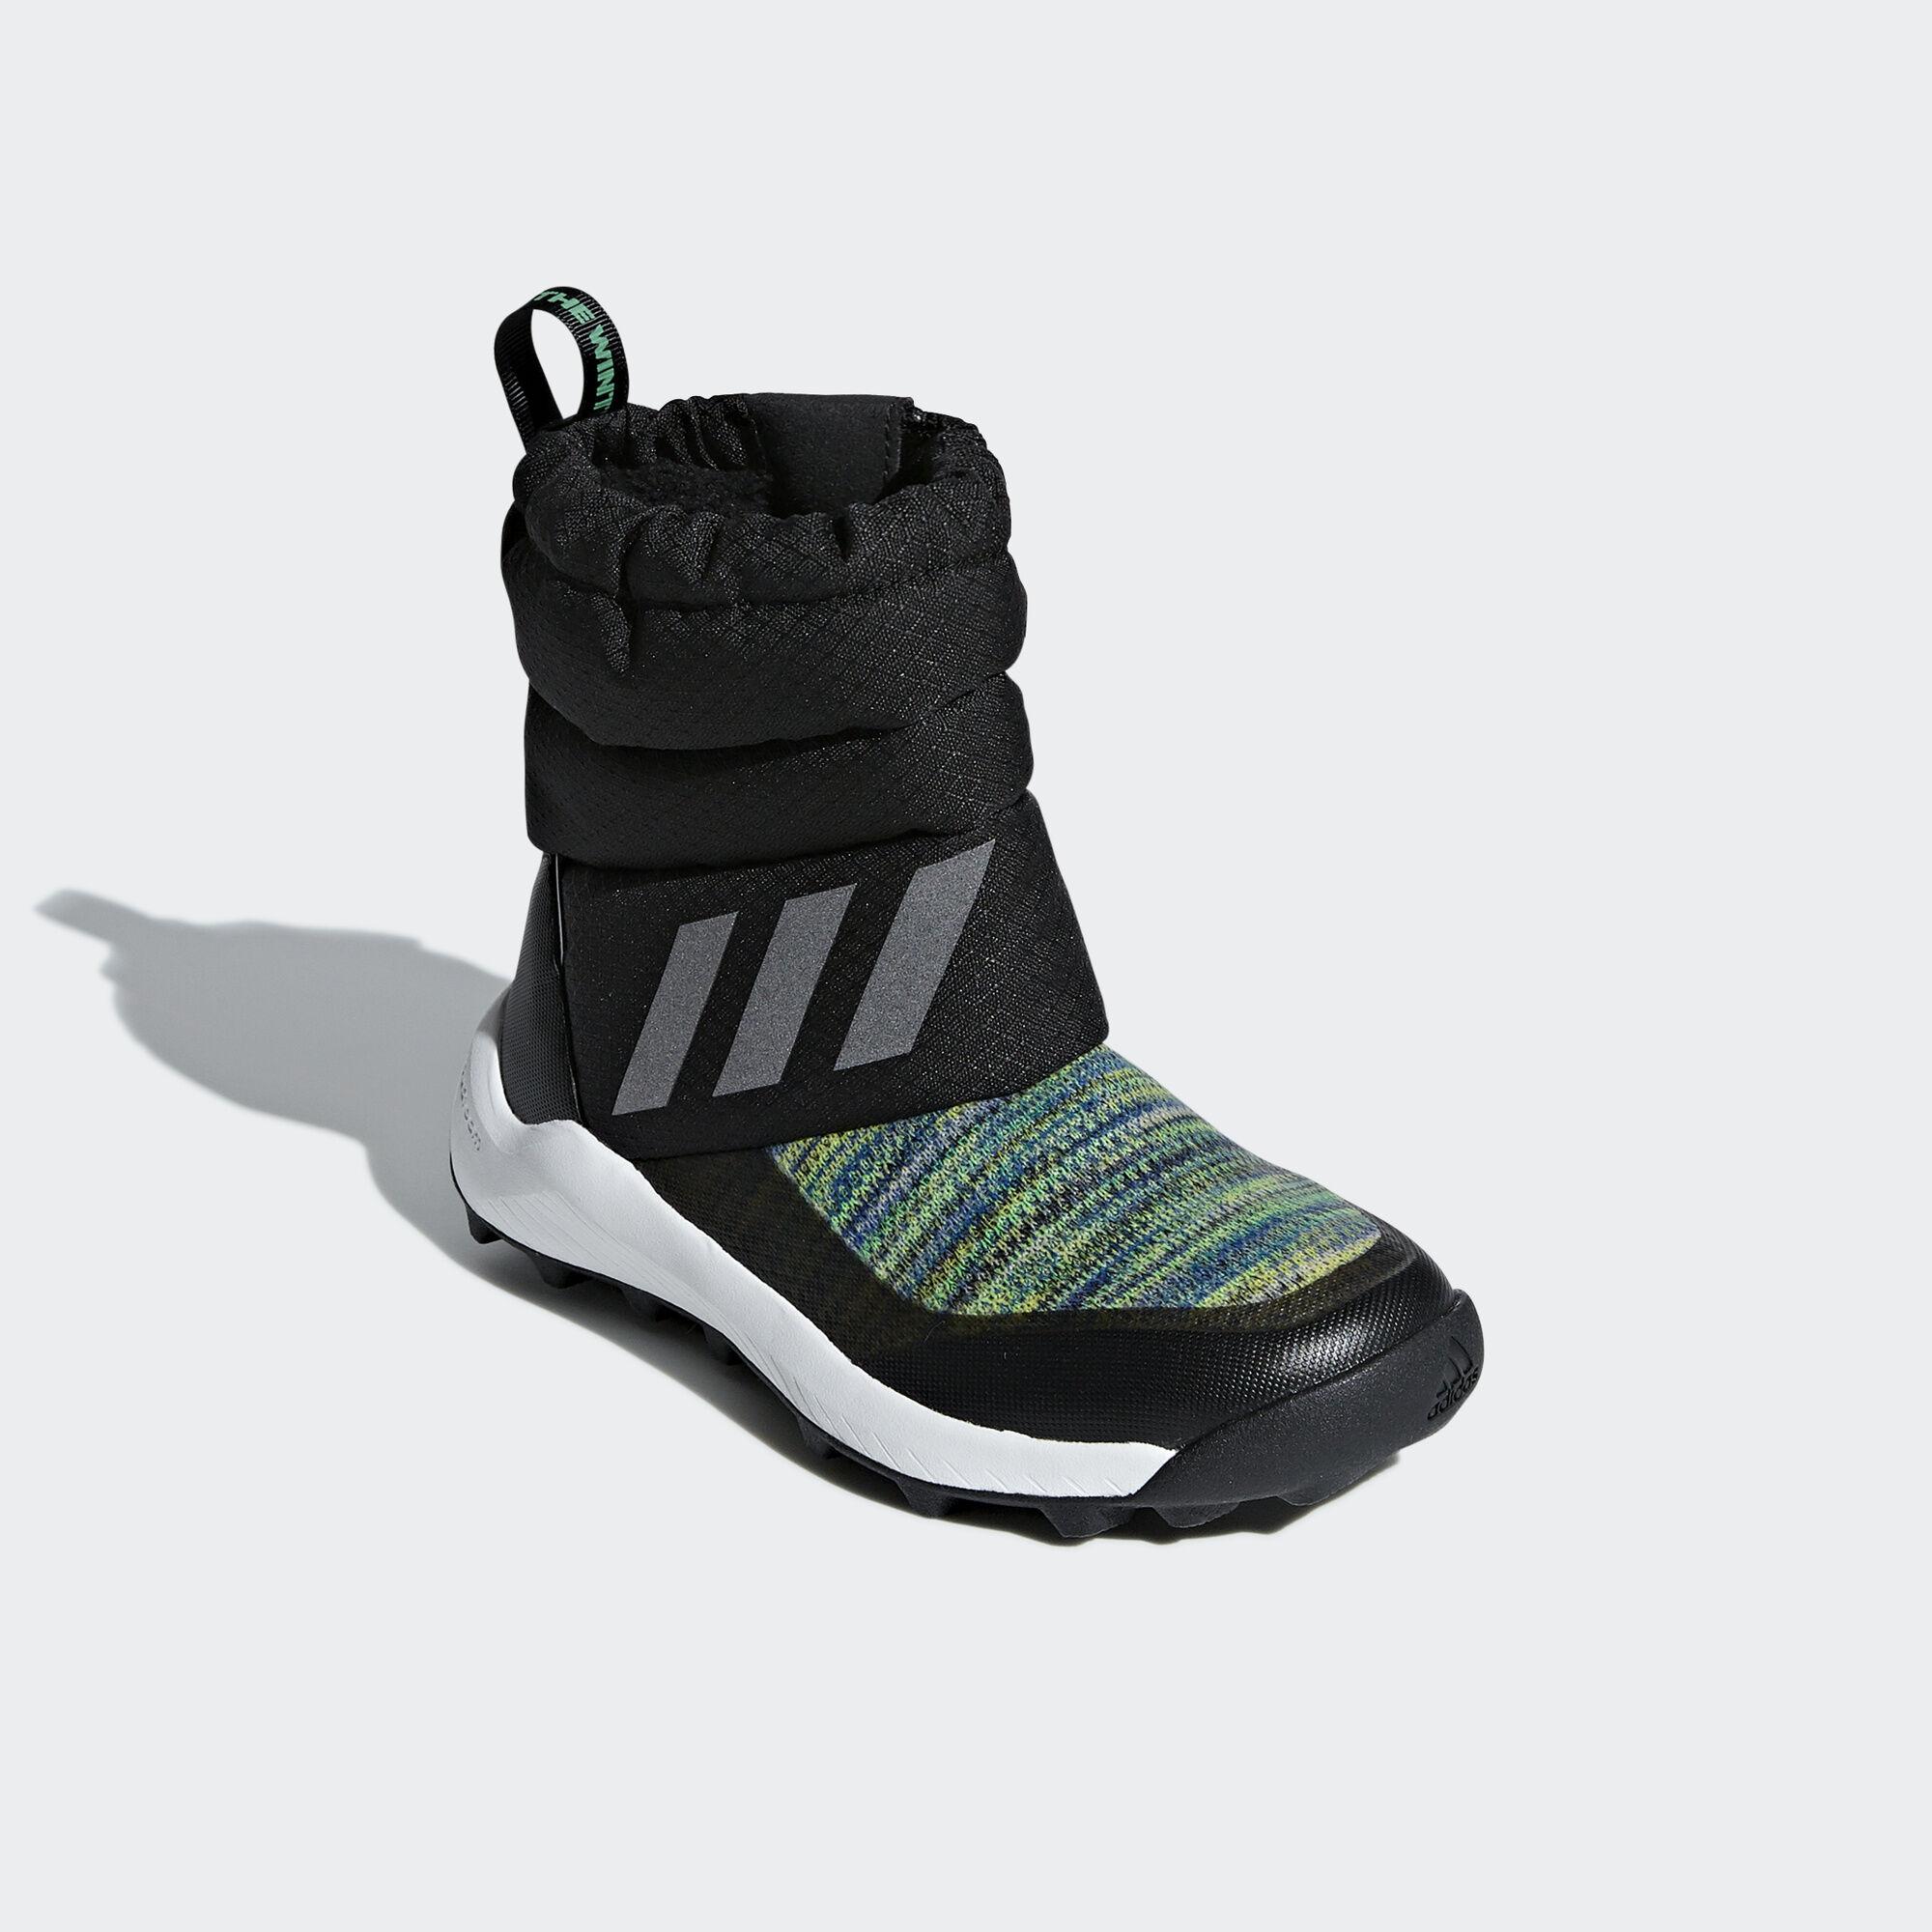 best loved 39c88 6ce98 adidas RapidaSnow Beat the Winter Boots - Black  adidas Turk